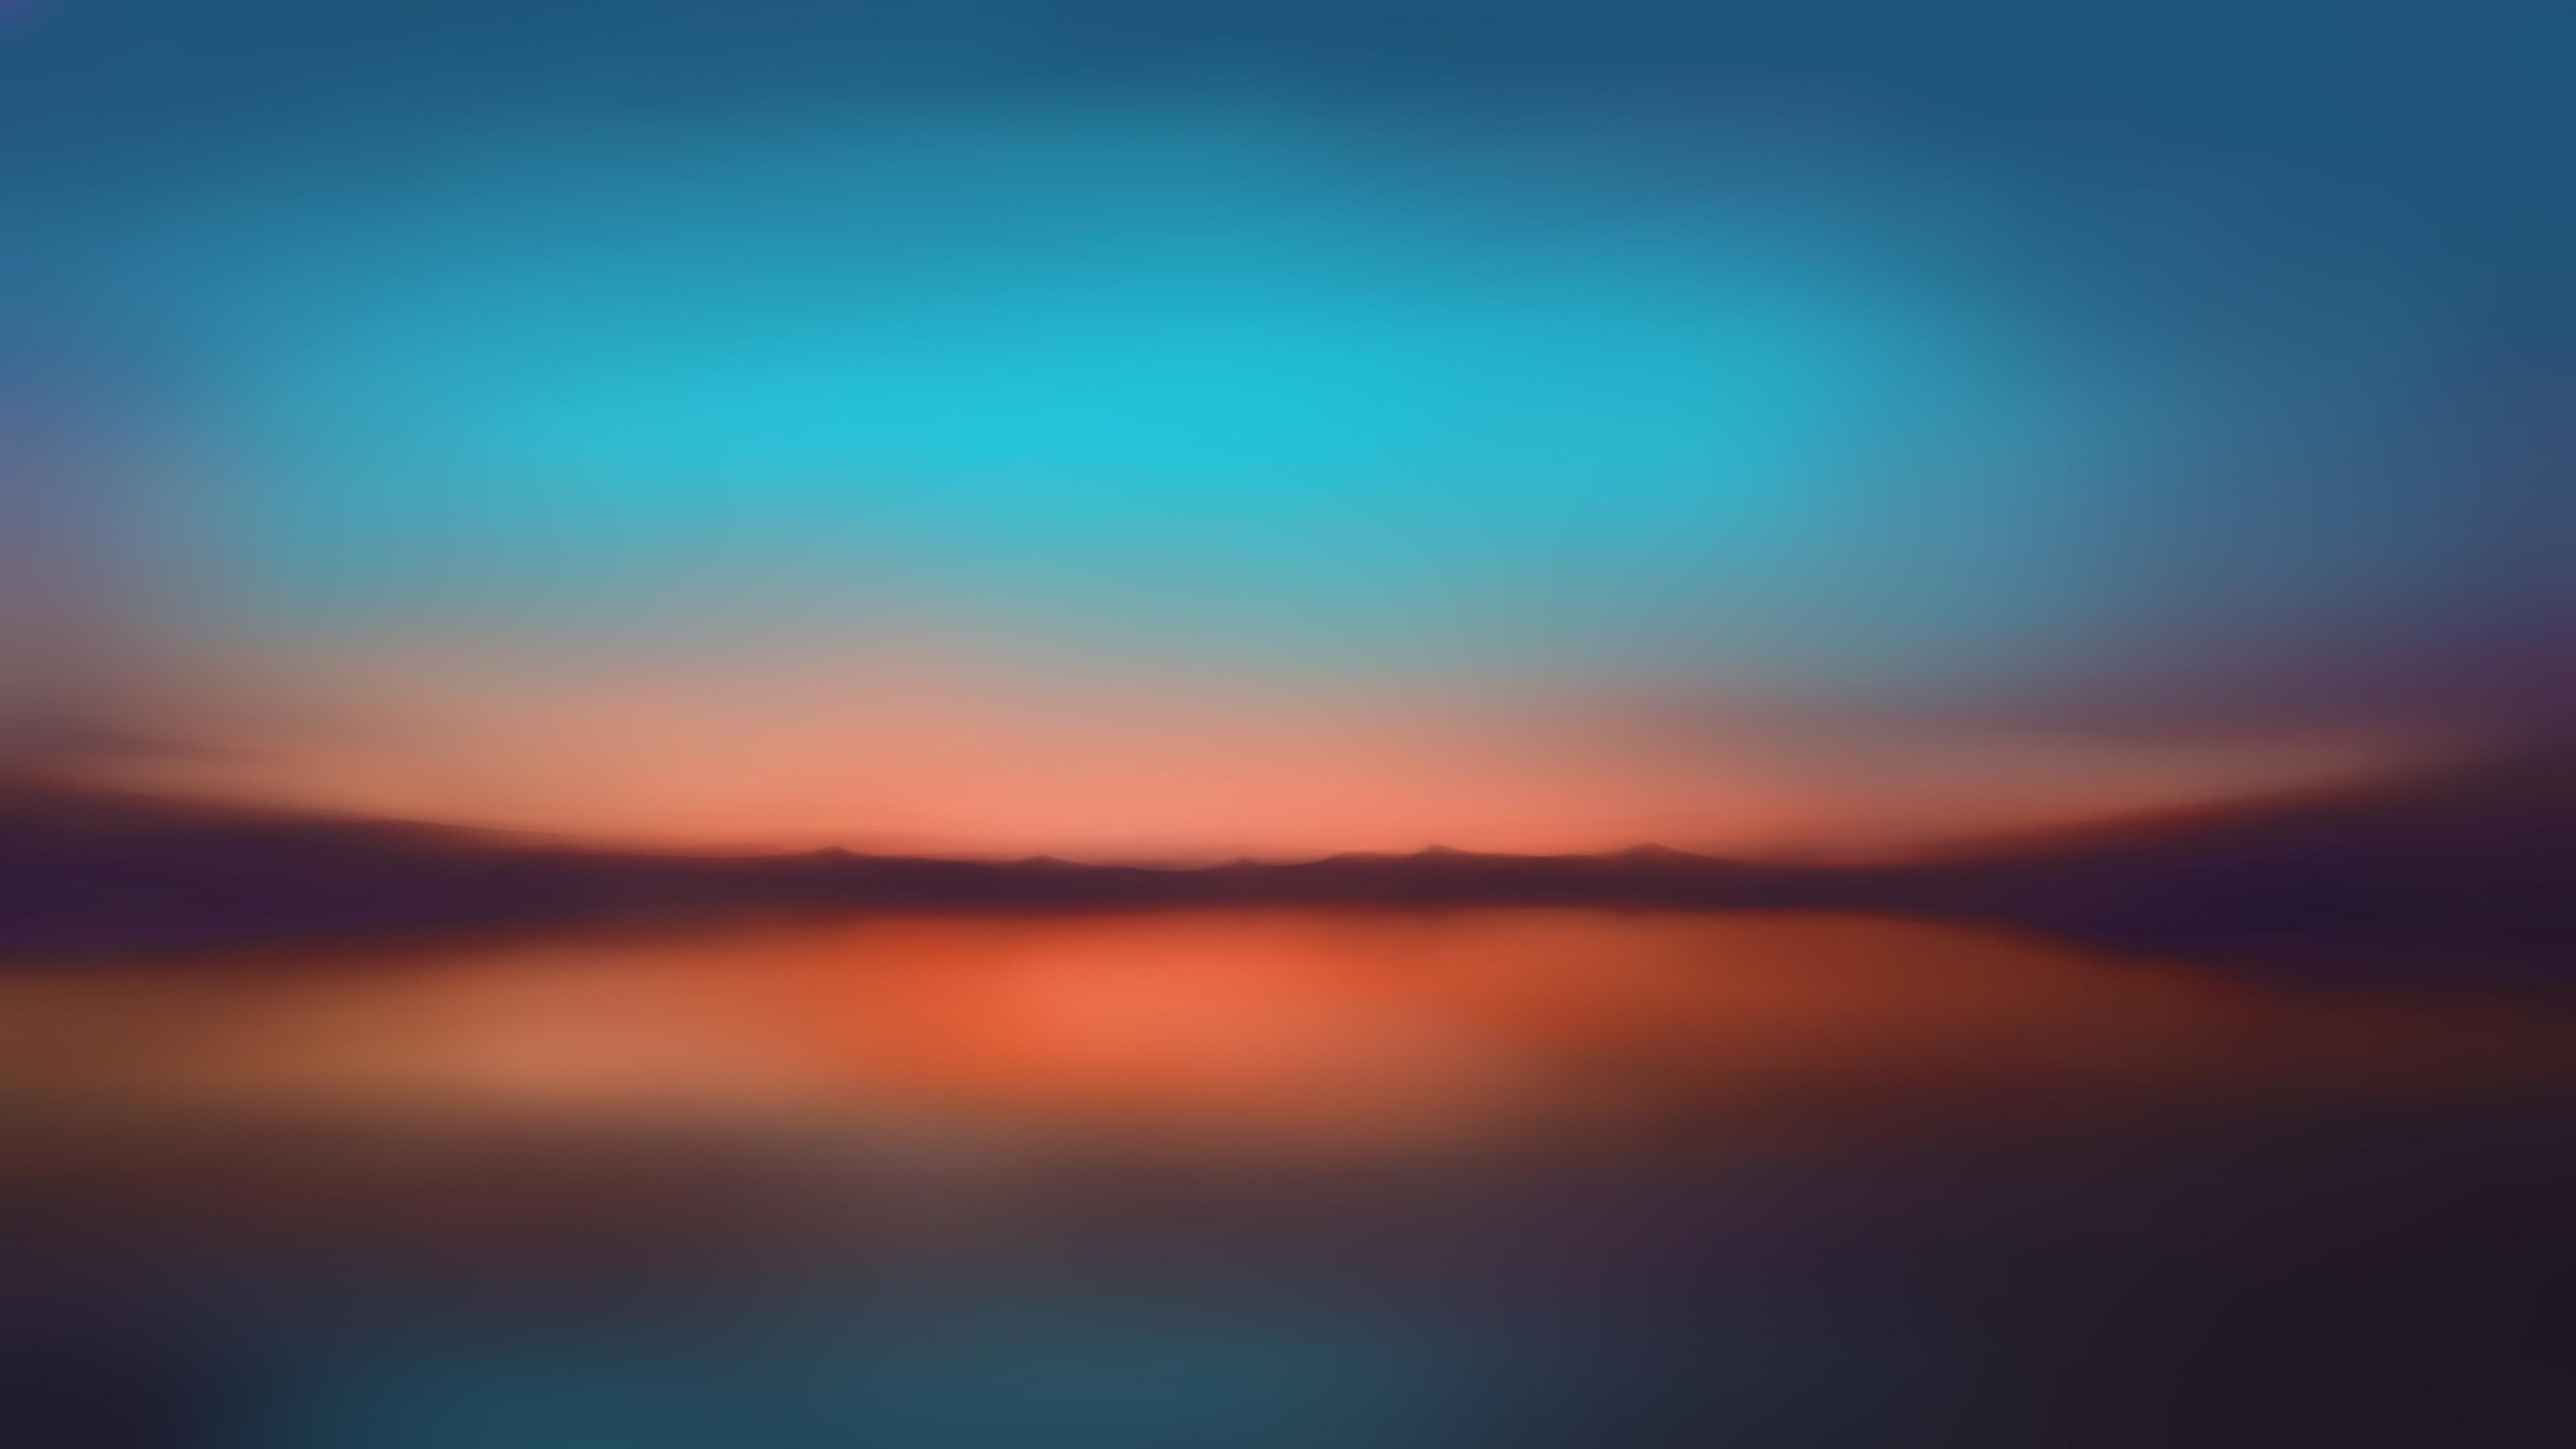 Wallpaper 4k Orange Sunset Blur Minimalist 5k 4k Wallpapers